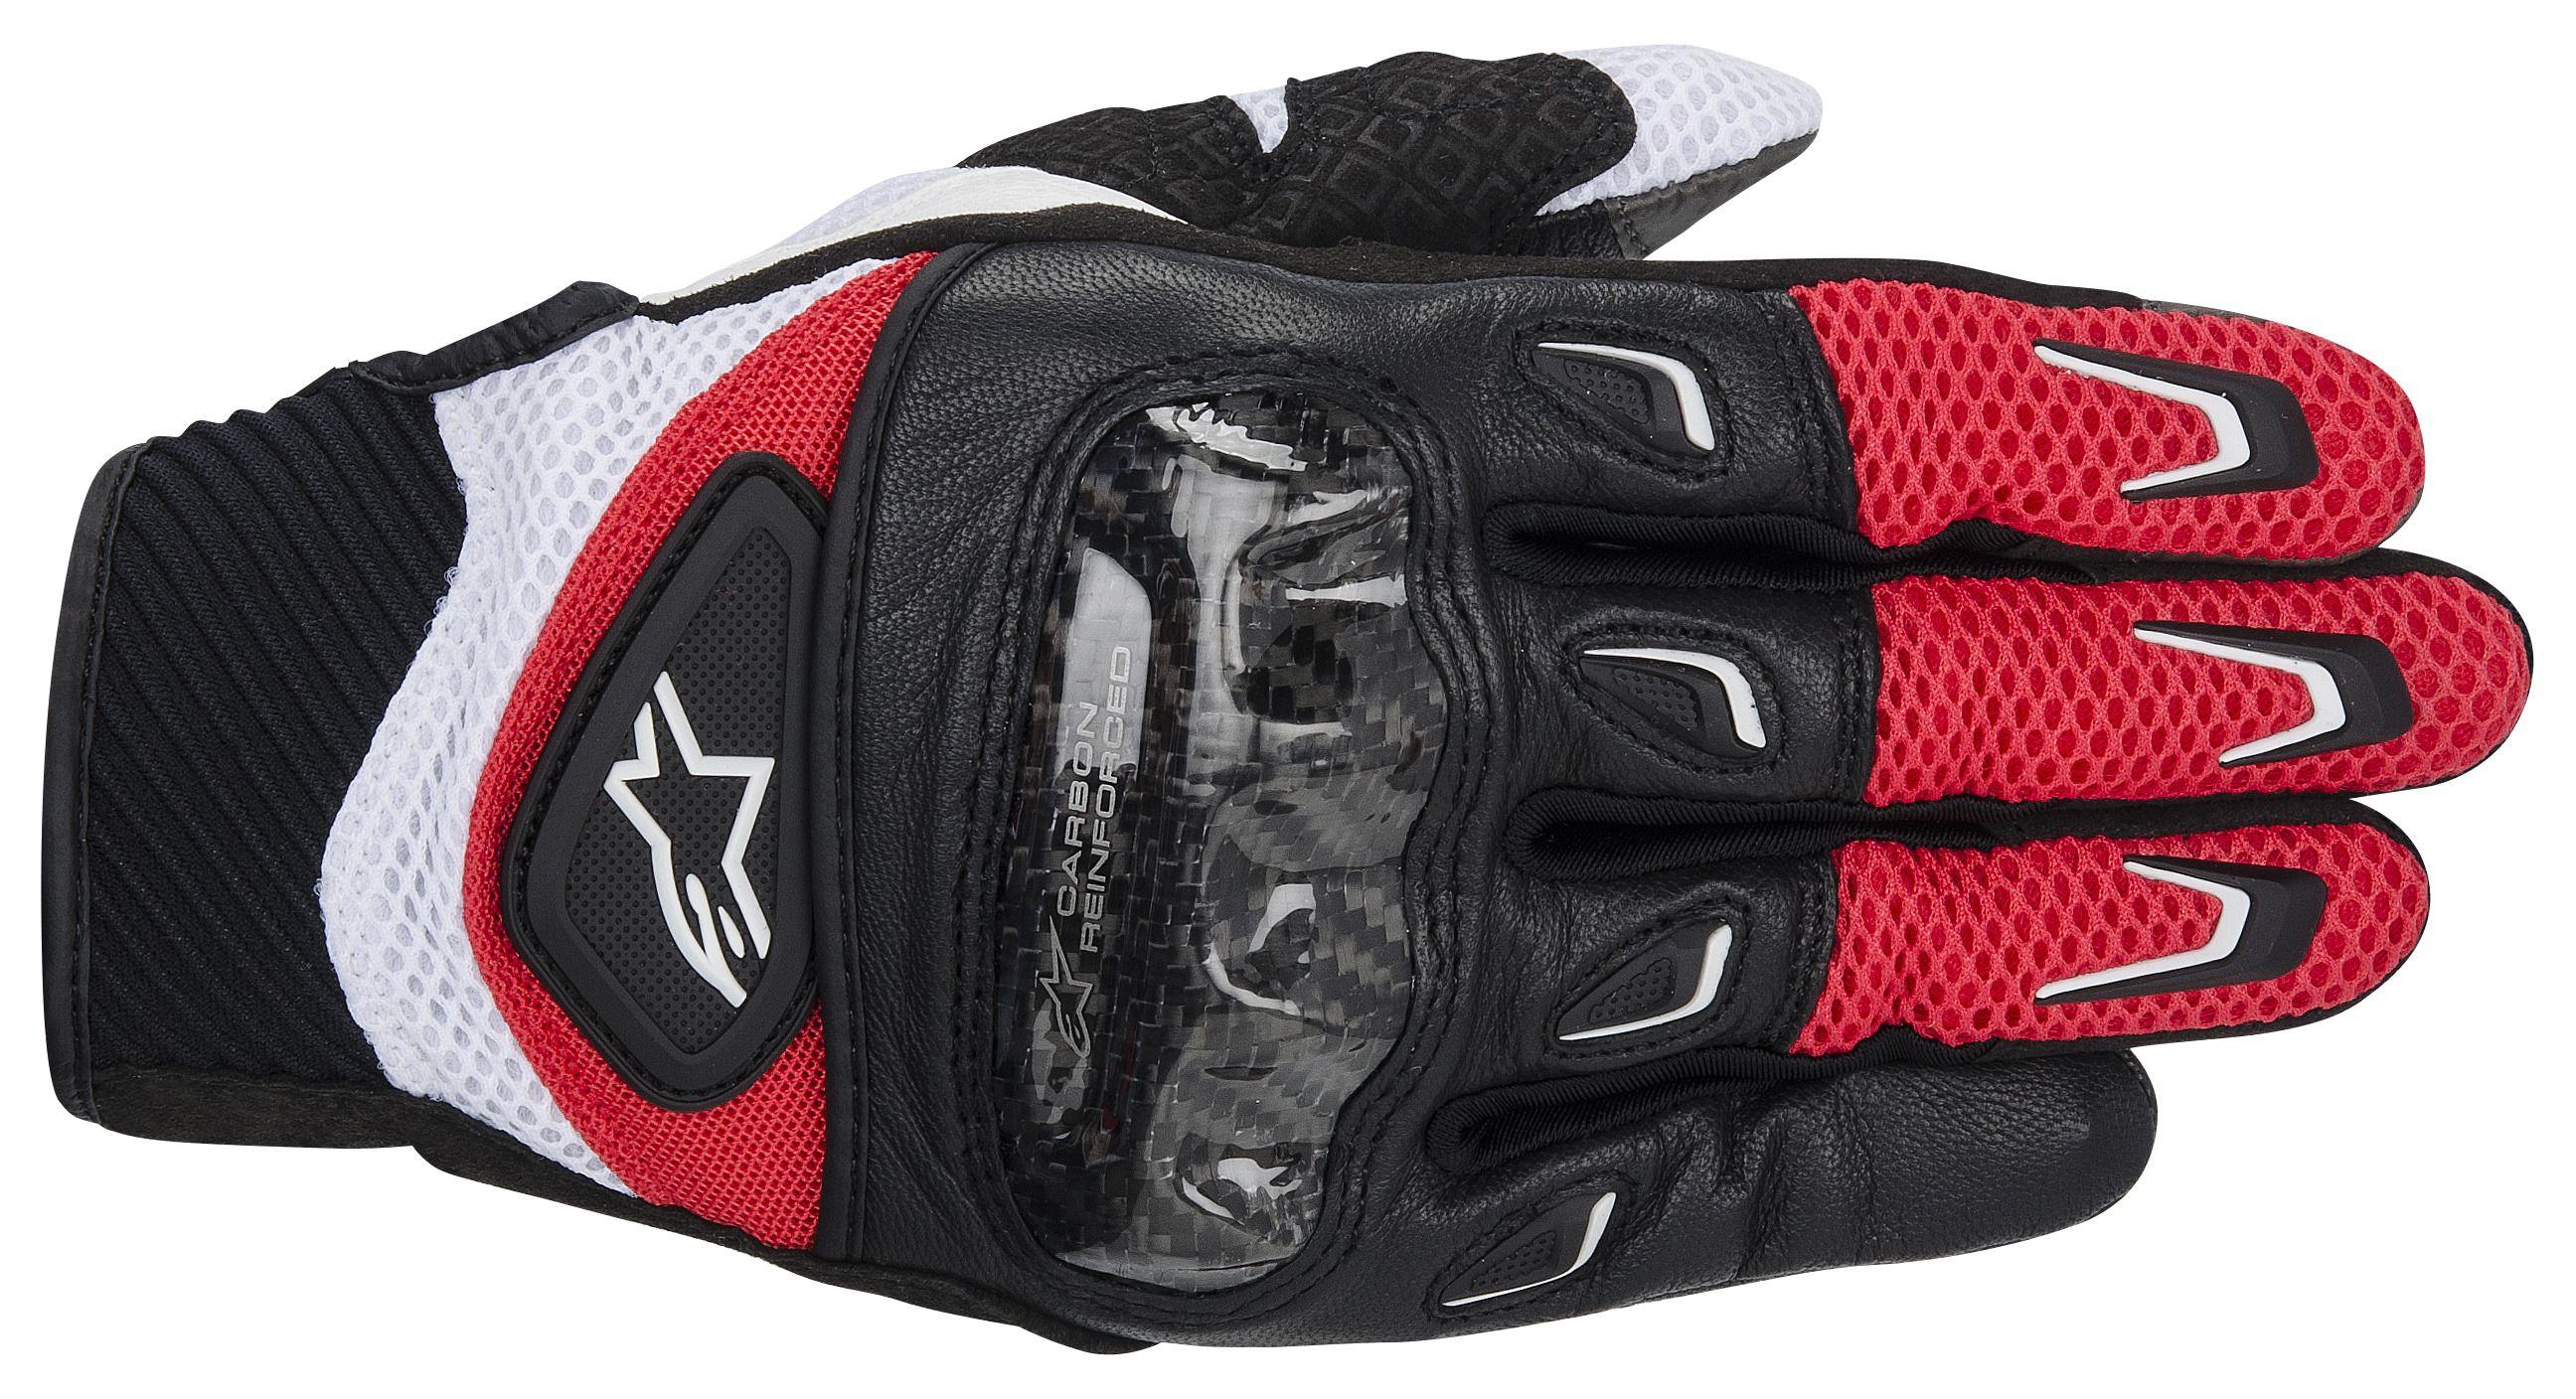 Alpinestar Motorcycle Gloves >> Alpinestars Smx 2 Air Carbon Gloves 37 29 97 Off Revzilla